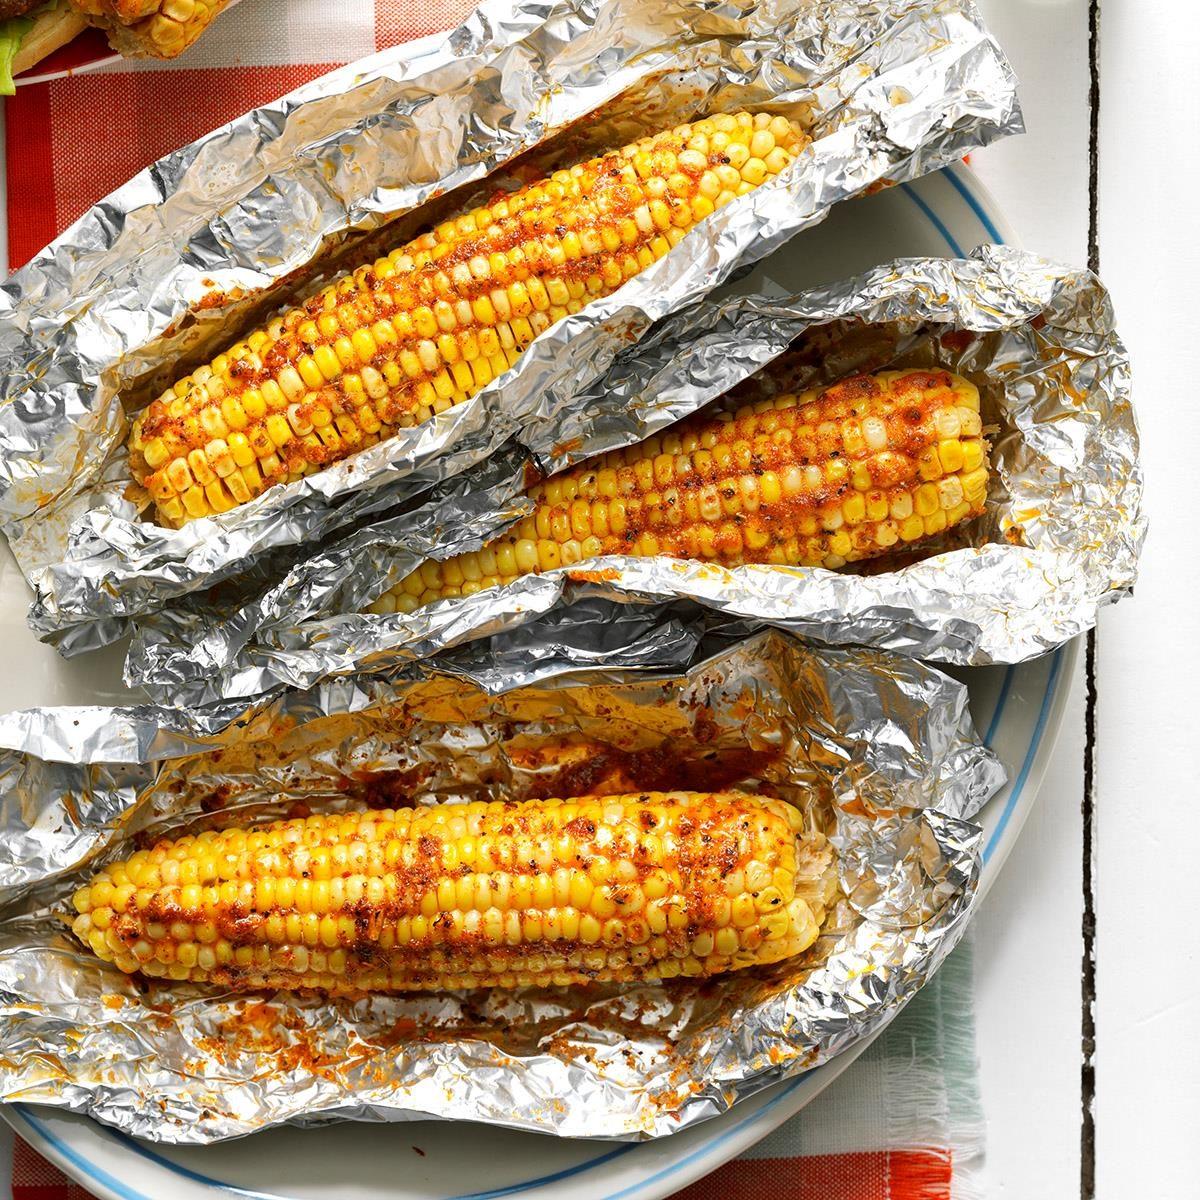 Slow cooked cajun corn recipe